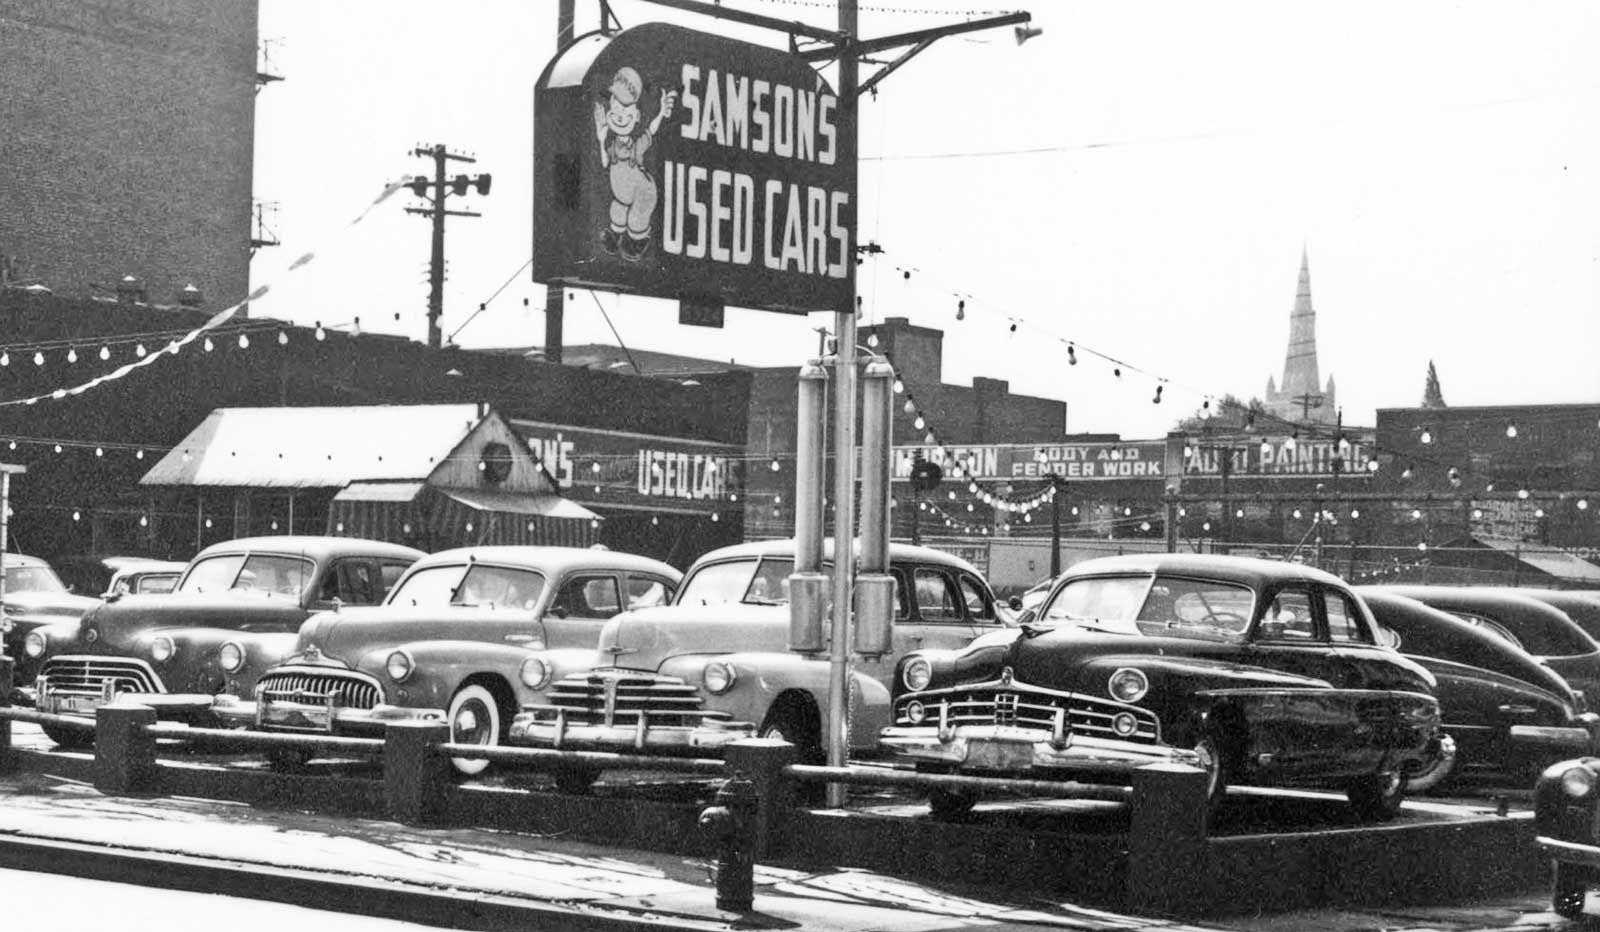 1951 Samson's Buick Dealership, Pittsburgh, Pennsylvania